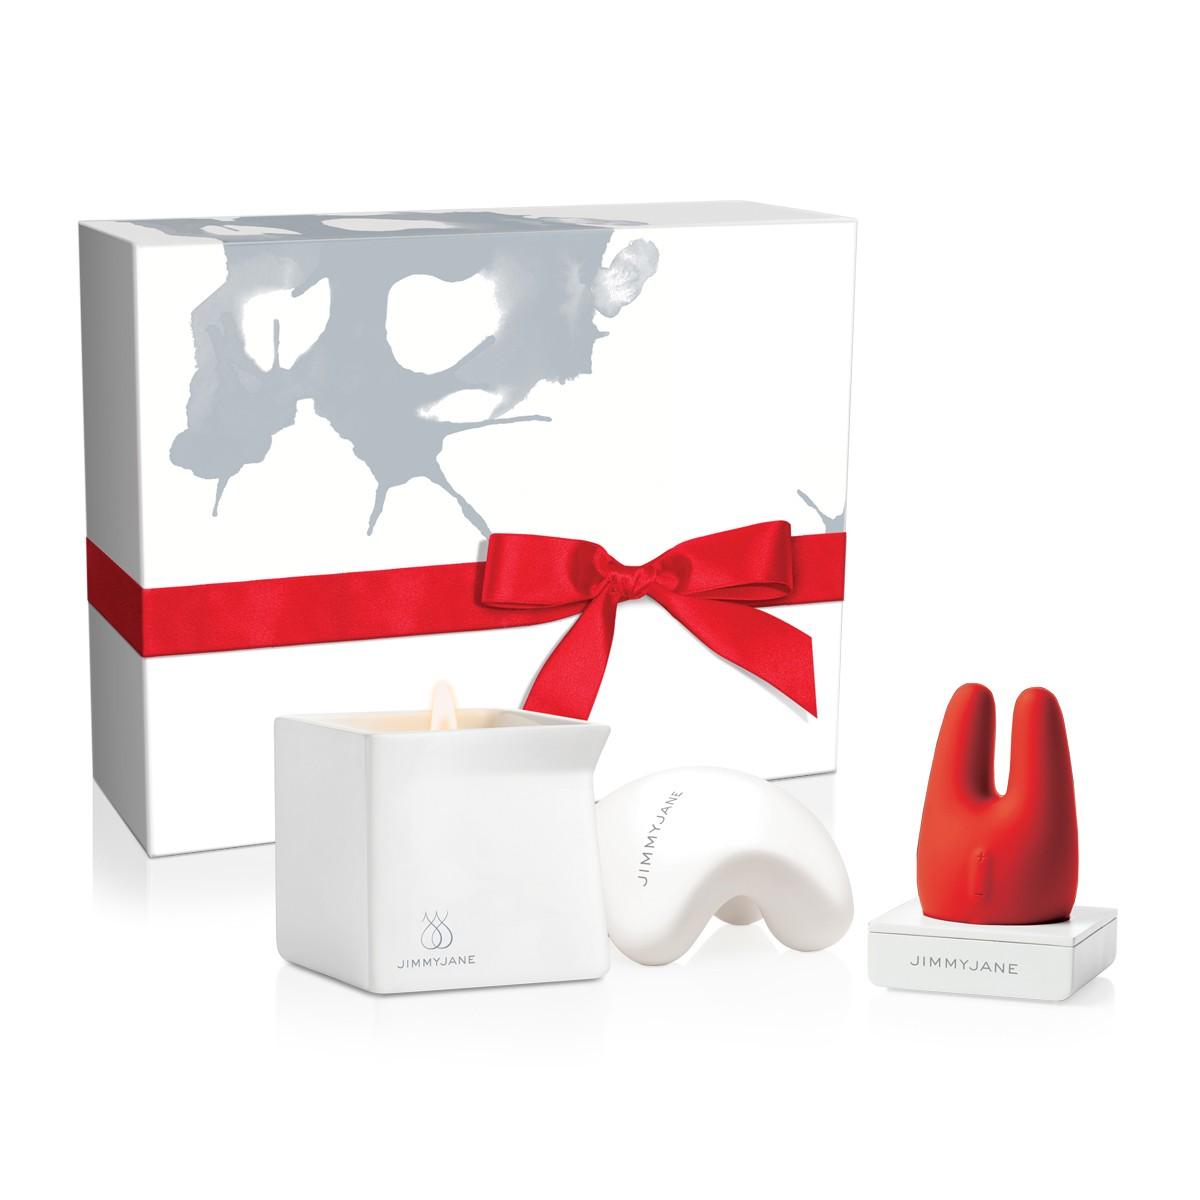 jimmyjane-afterdark-gift-set.jpg